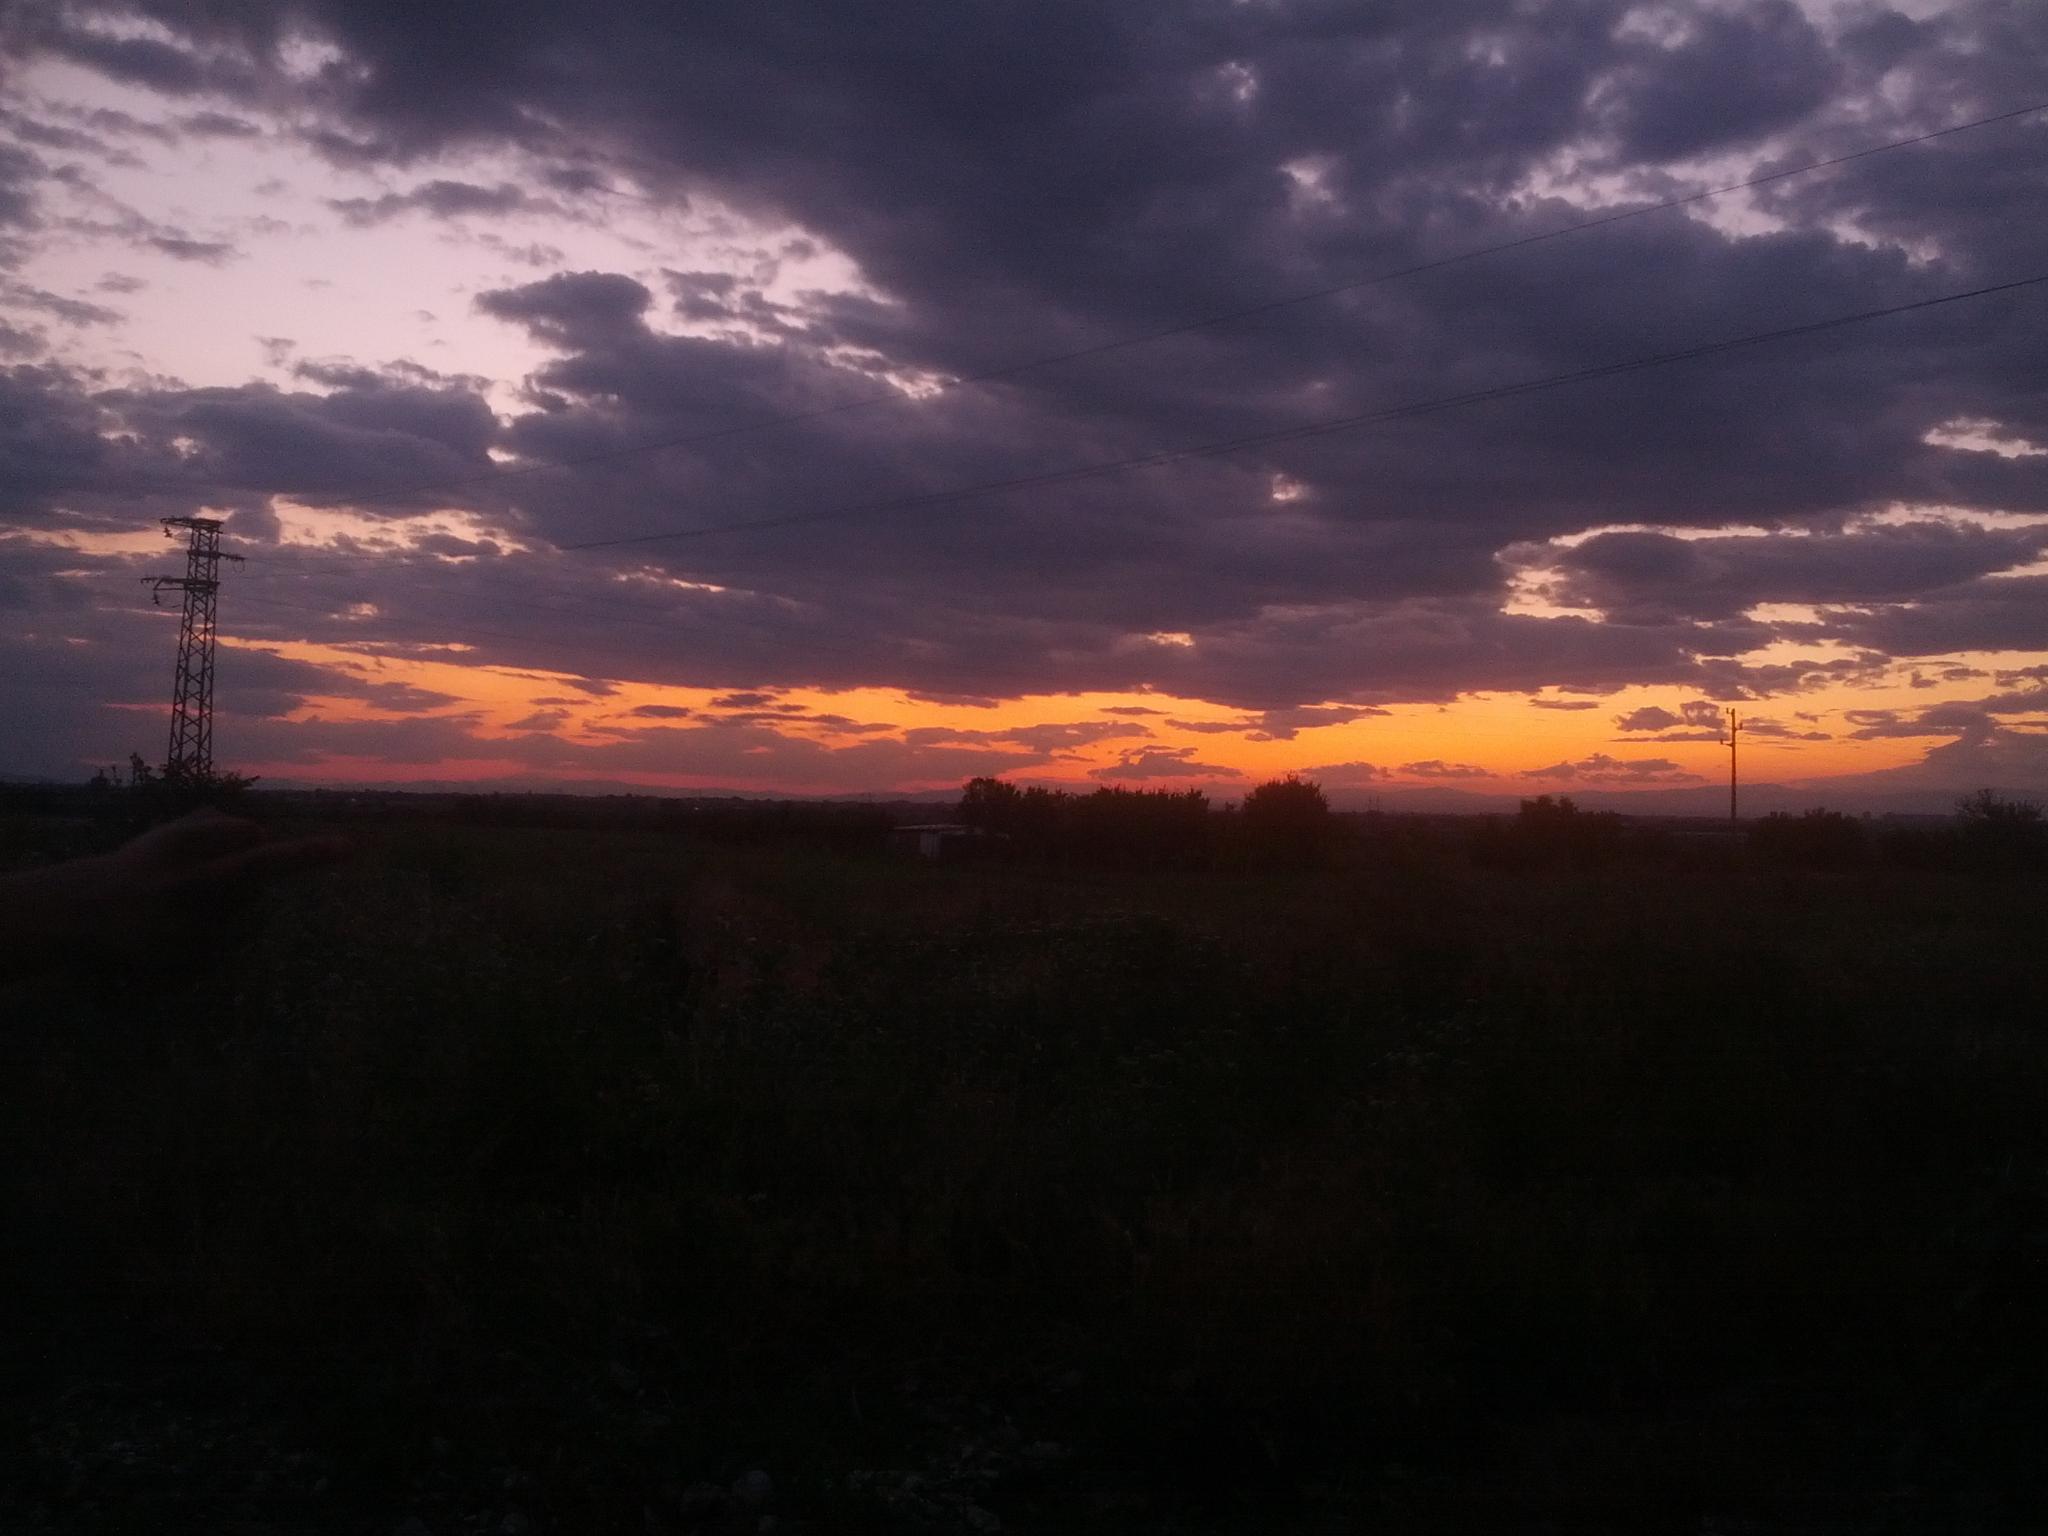 Another sunset  by George Georgiev Bozhinov